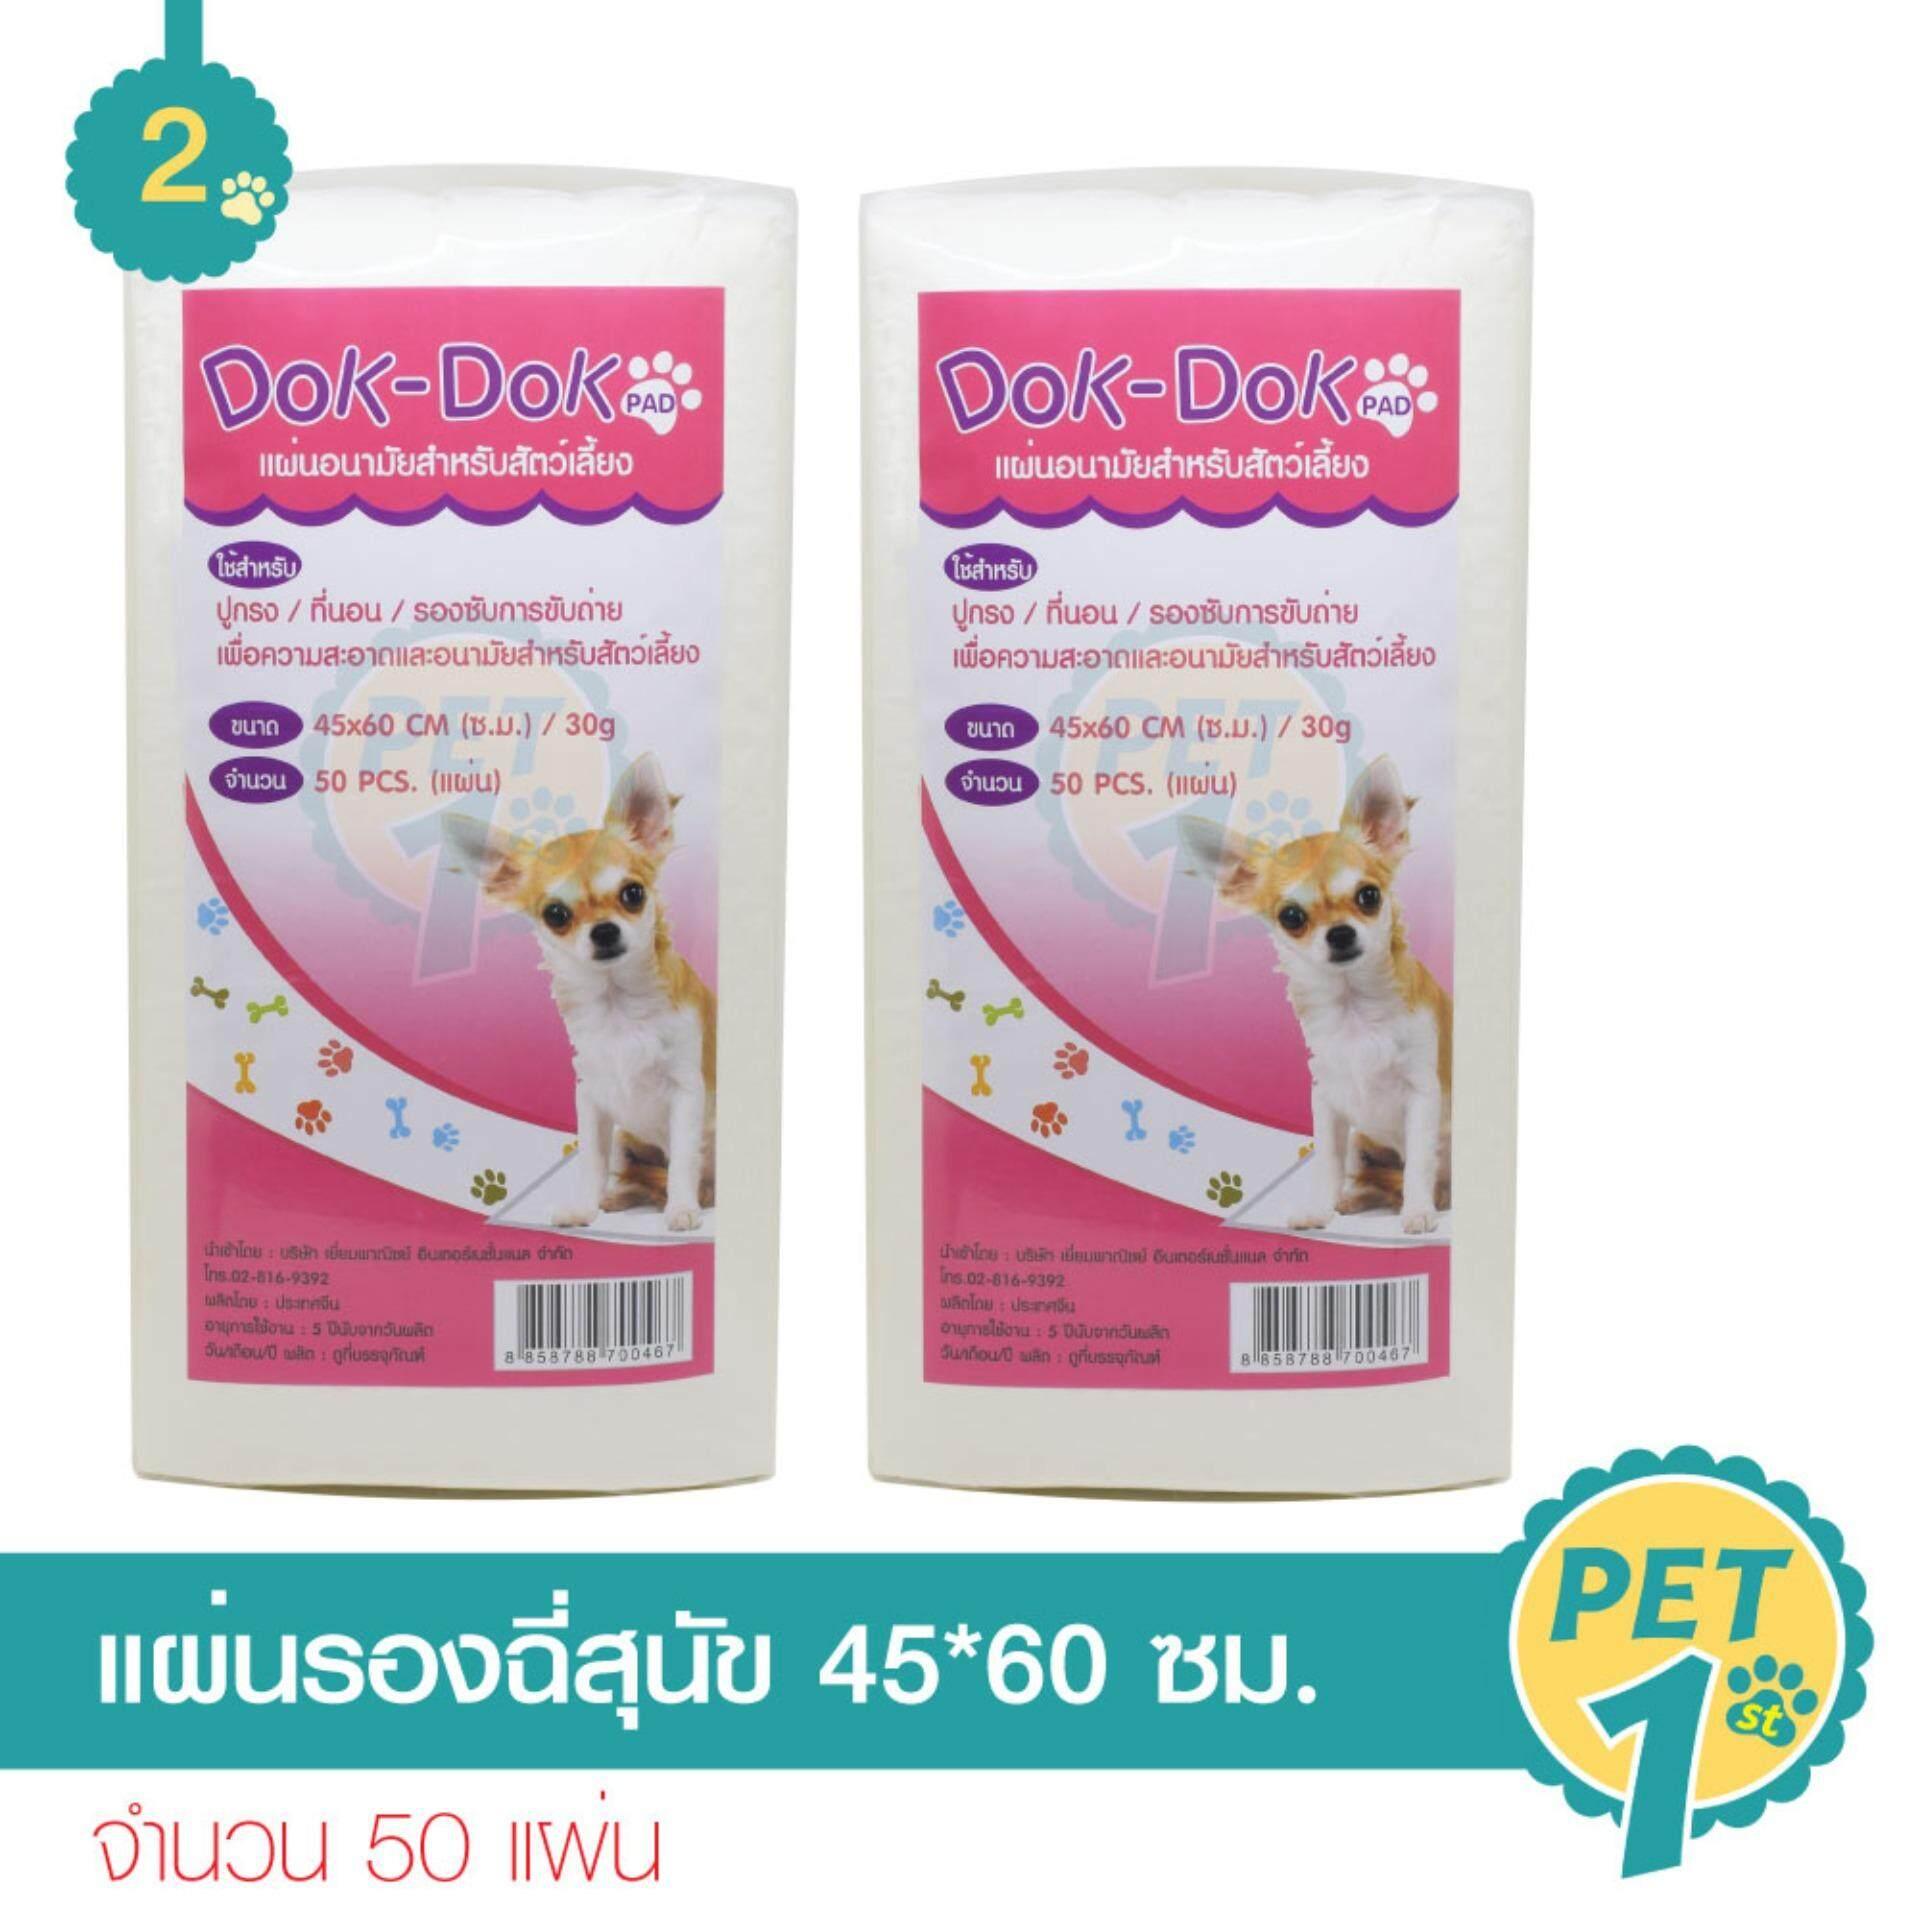 Dok Dok แผ่นรองฉี่สุนัข แผ่นอนามัยสัตว์เลี้ยง Size M ขนาด 45x60 ซม. (50 แผ่น/ แพ็ค) จำนวน 2 แพ็ค By Pet First.